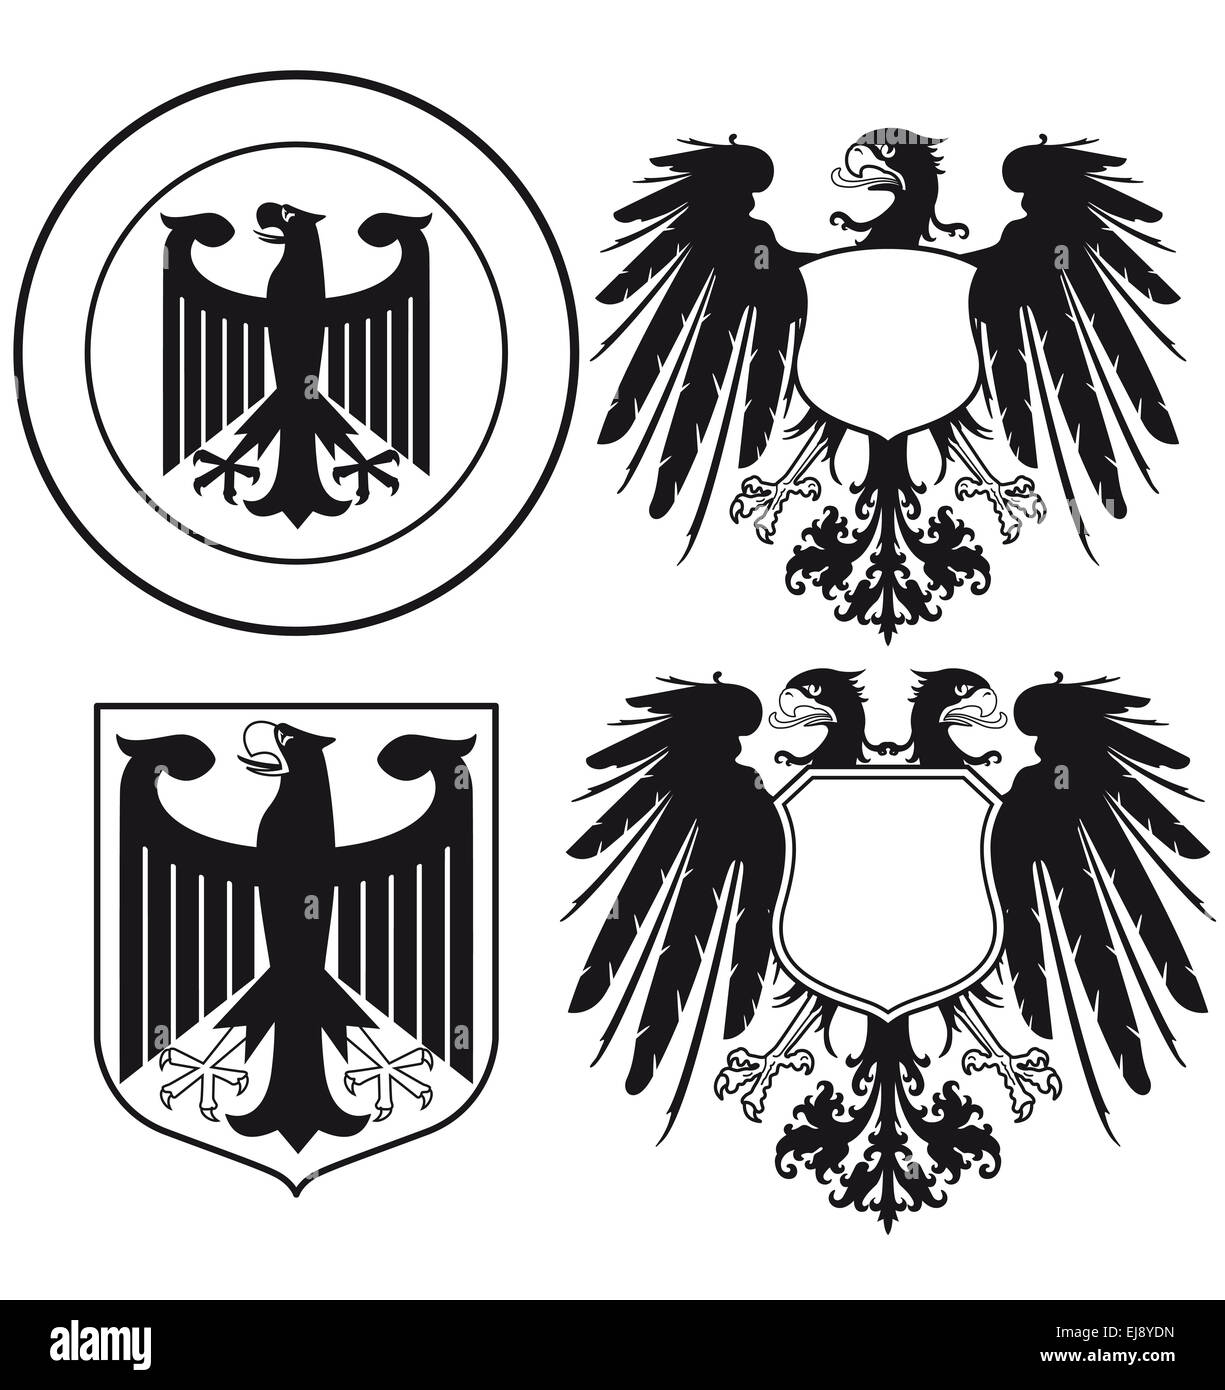 Eagle heraldic shields - Stock Image